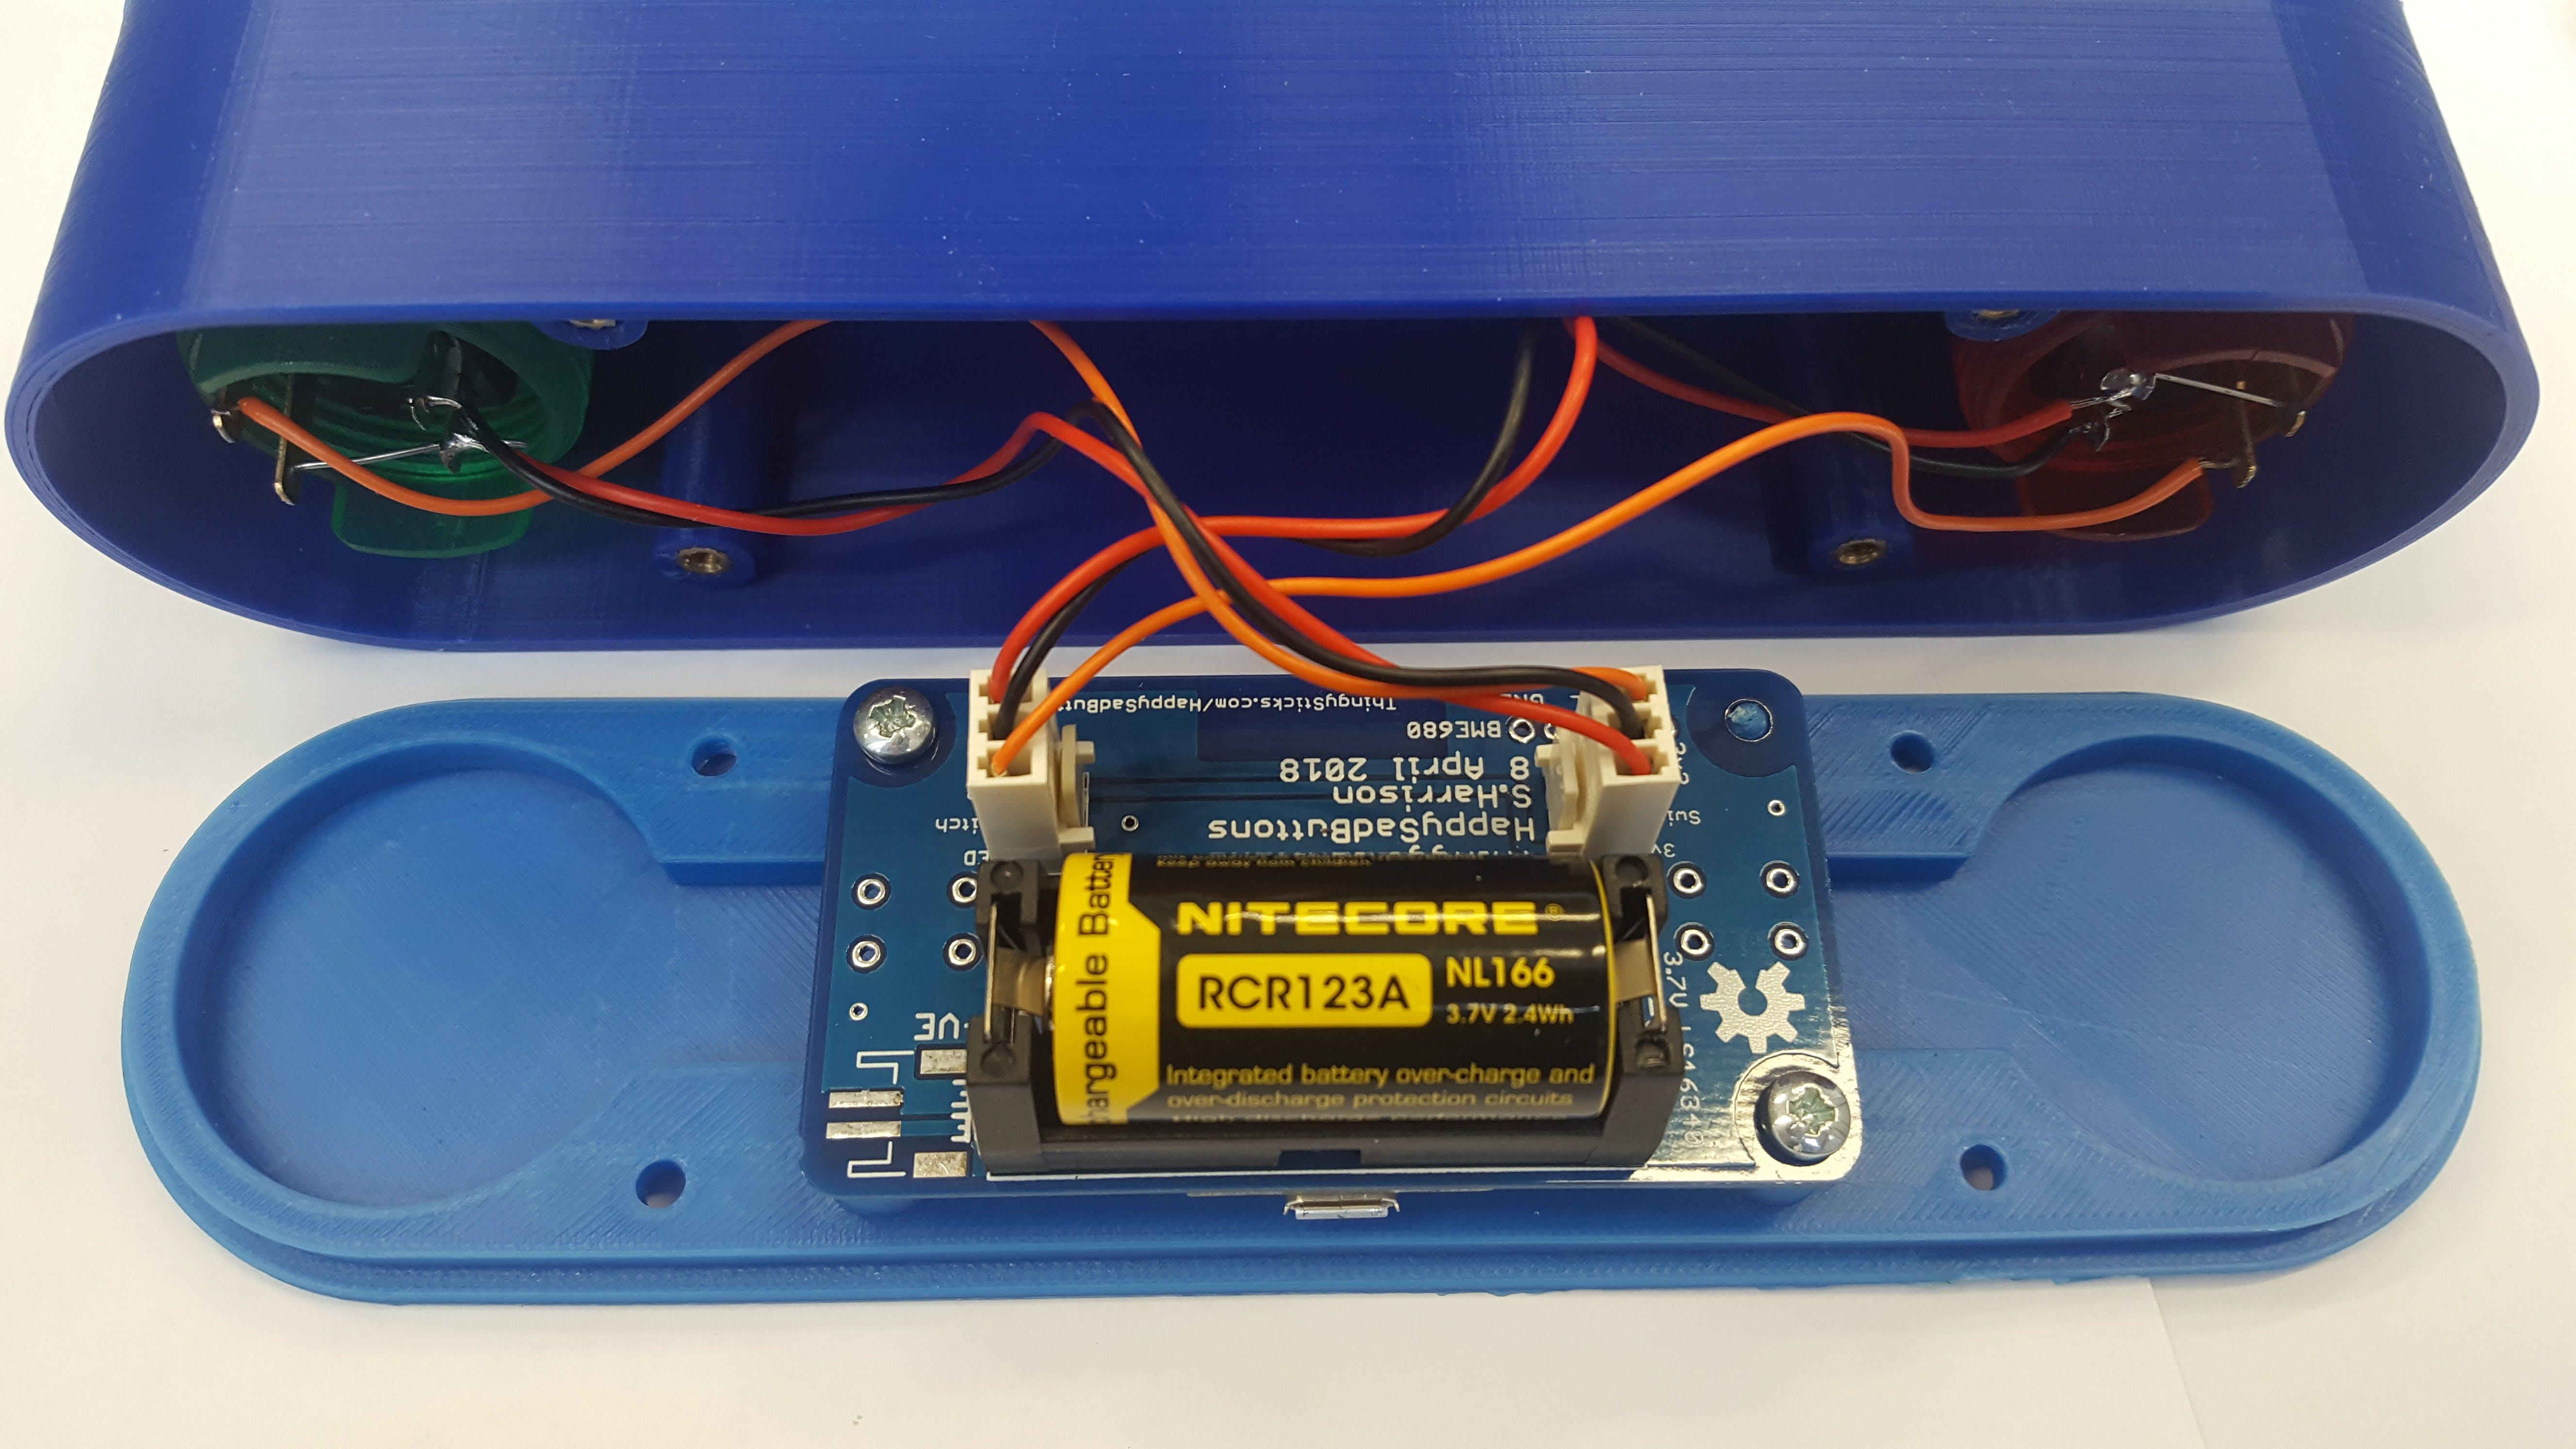 Clashing battery options (bottom left)